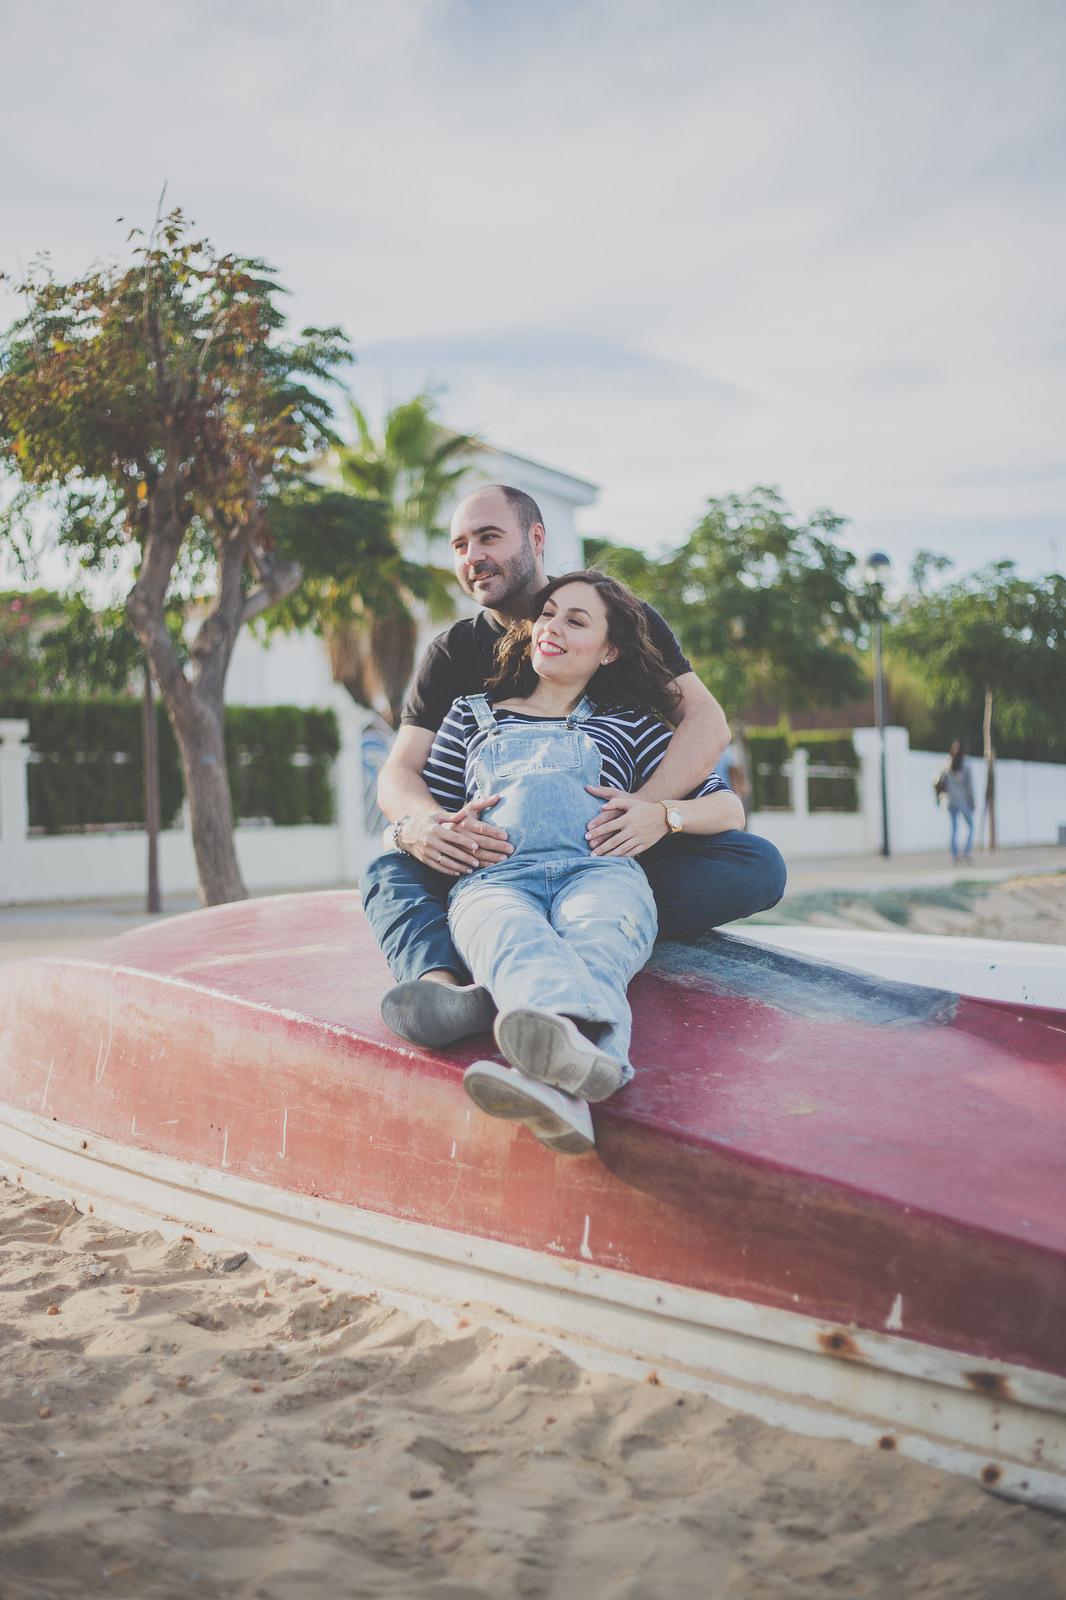 sesion embarazo silvia orduna fotografia huelva playa 12